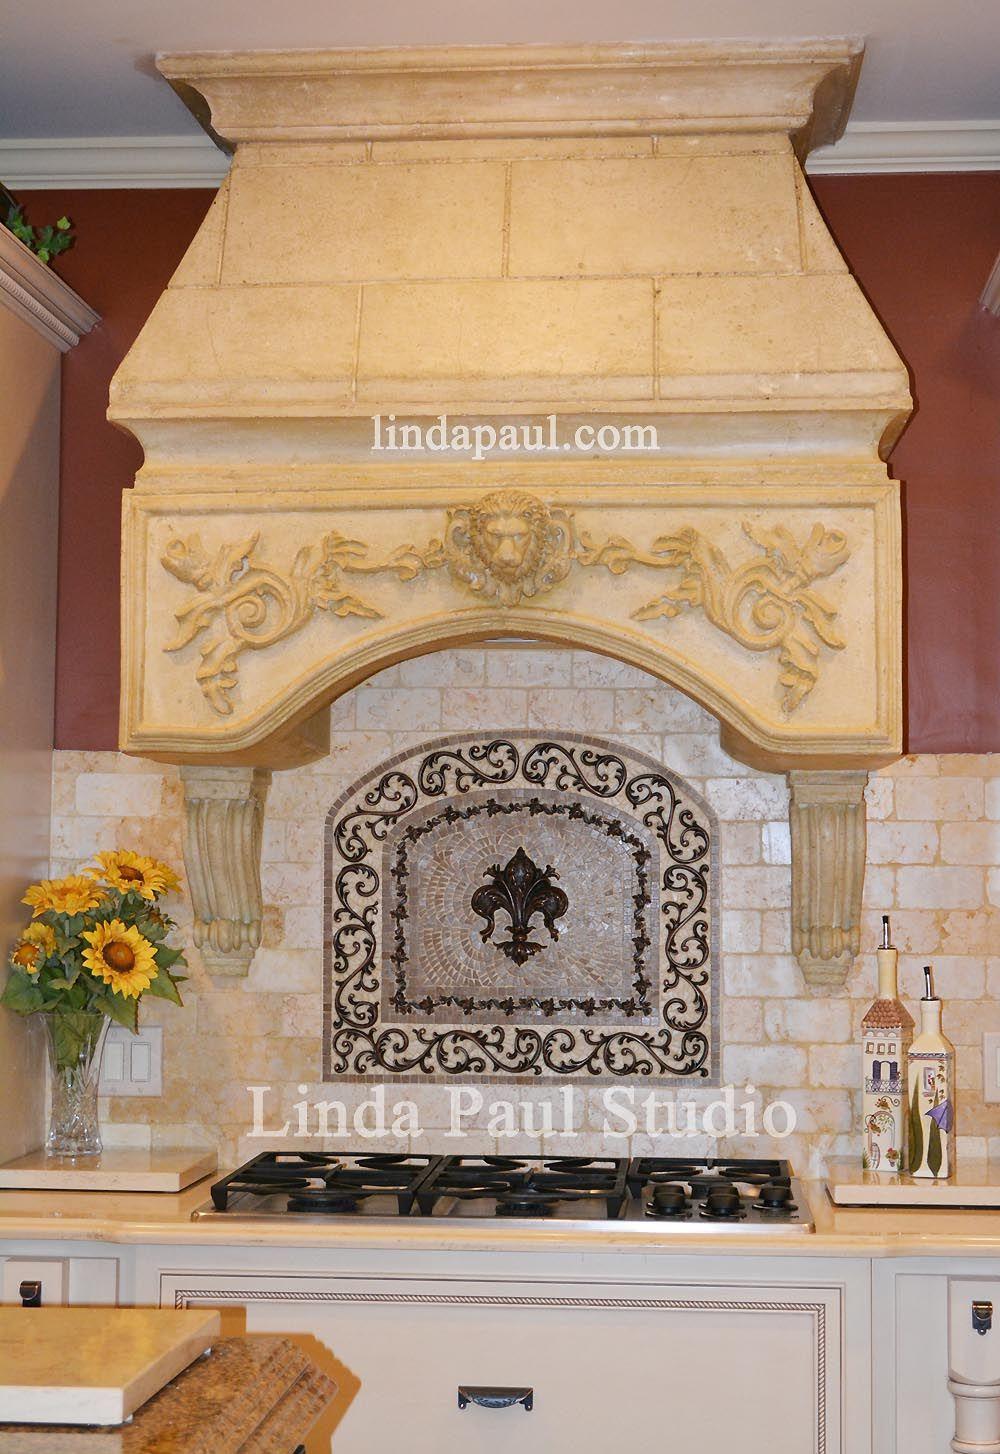 Fleur de lis backsplash tiles - Fleur De Lis Kitchen Backsplash Medallion From Linda Paul Studio See More Details At Lindapaul